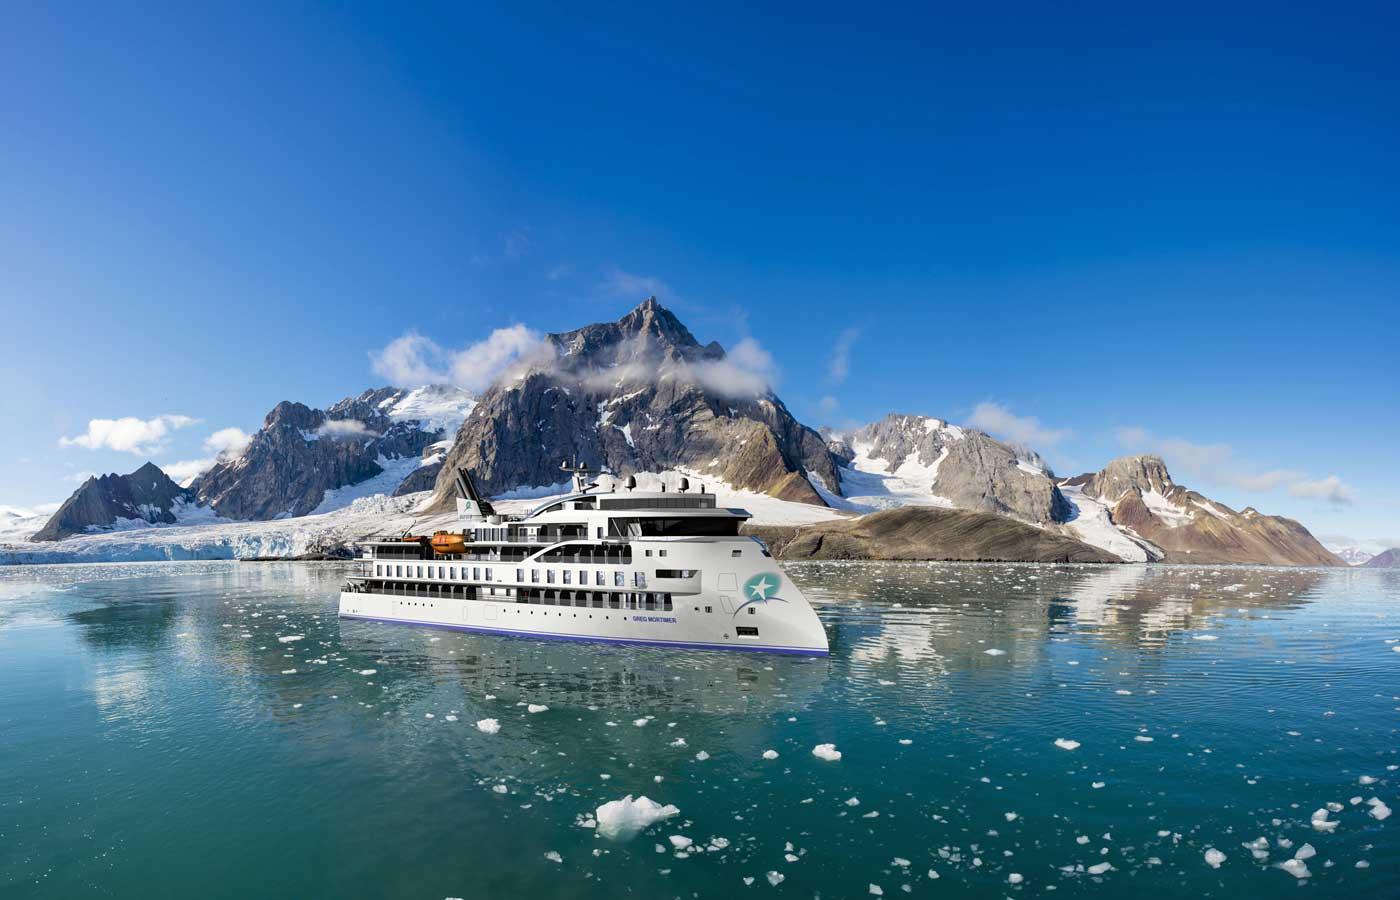 Greg Mortimer, Luxury Antarctica cruise